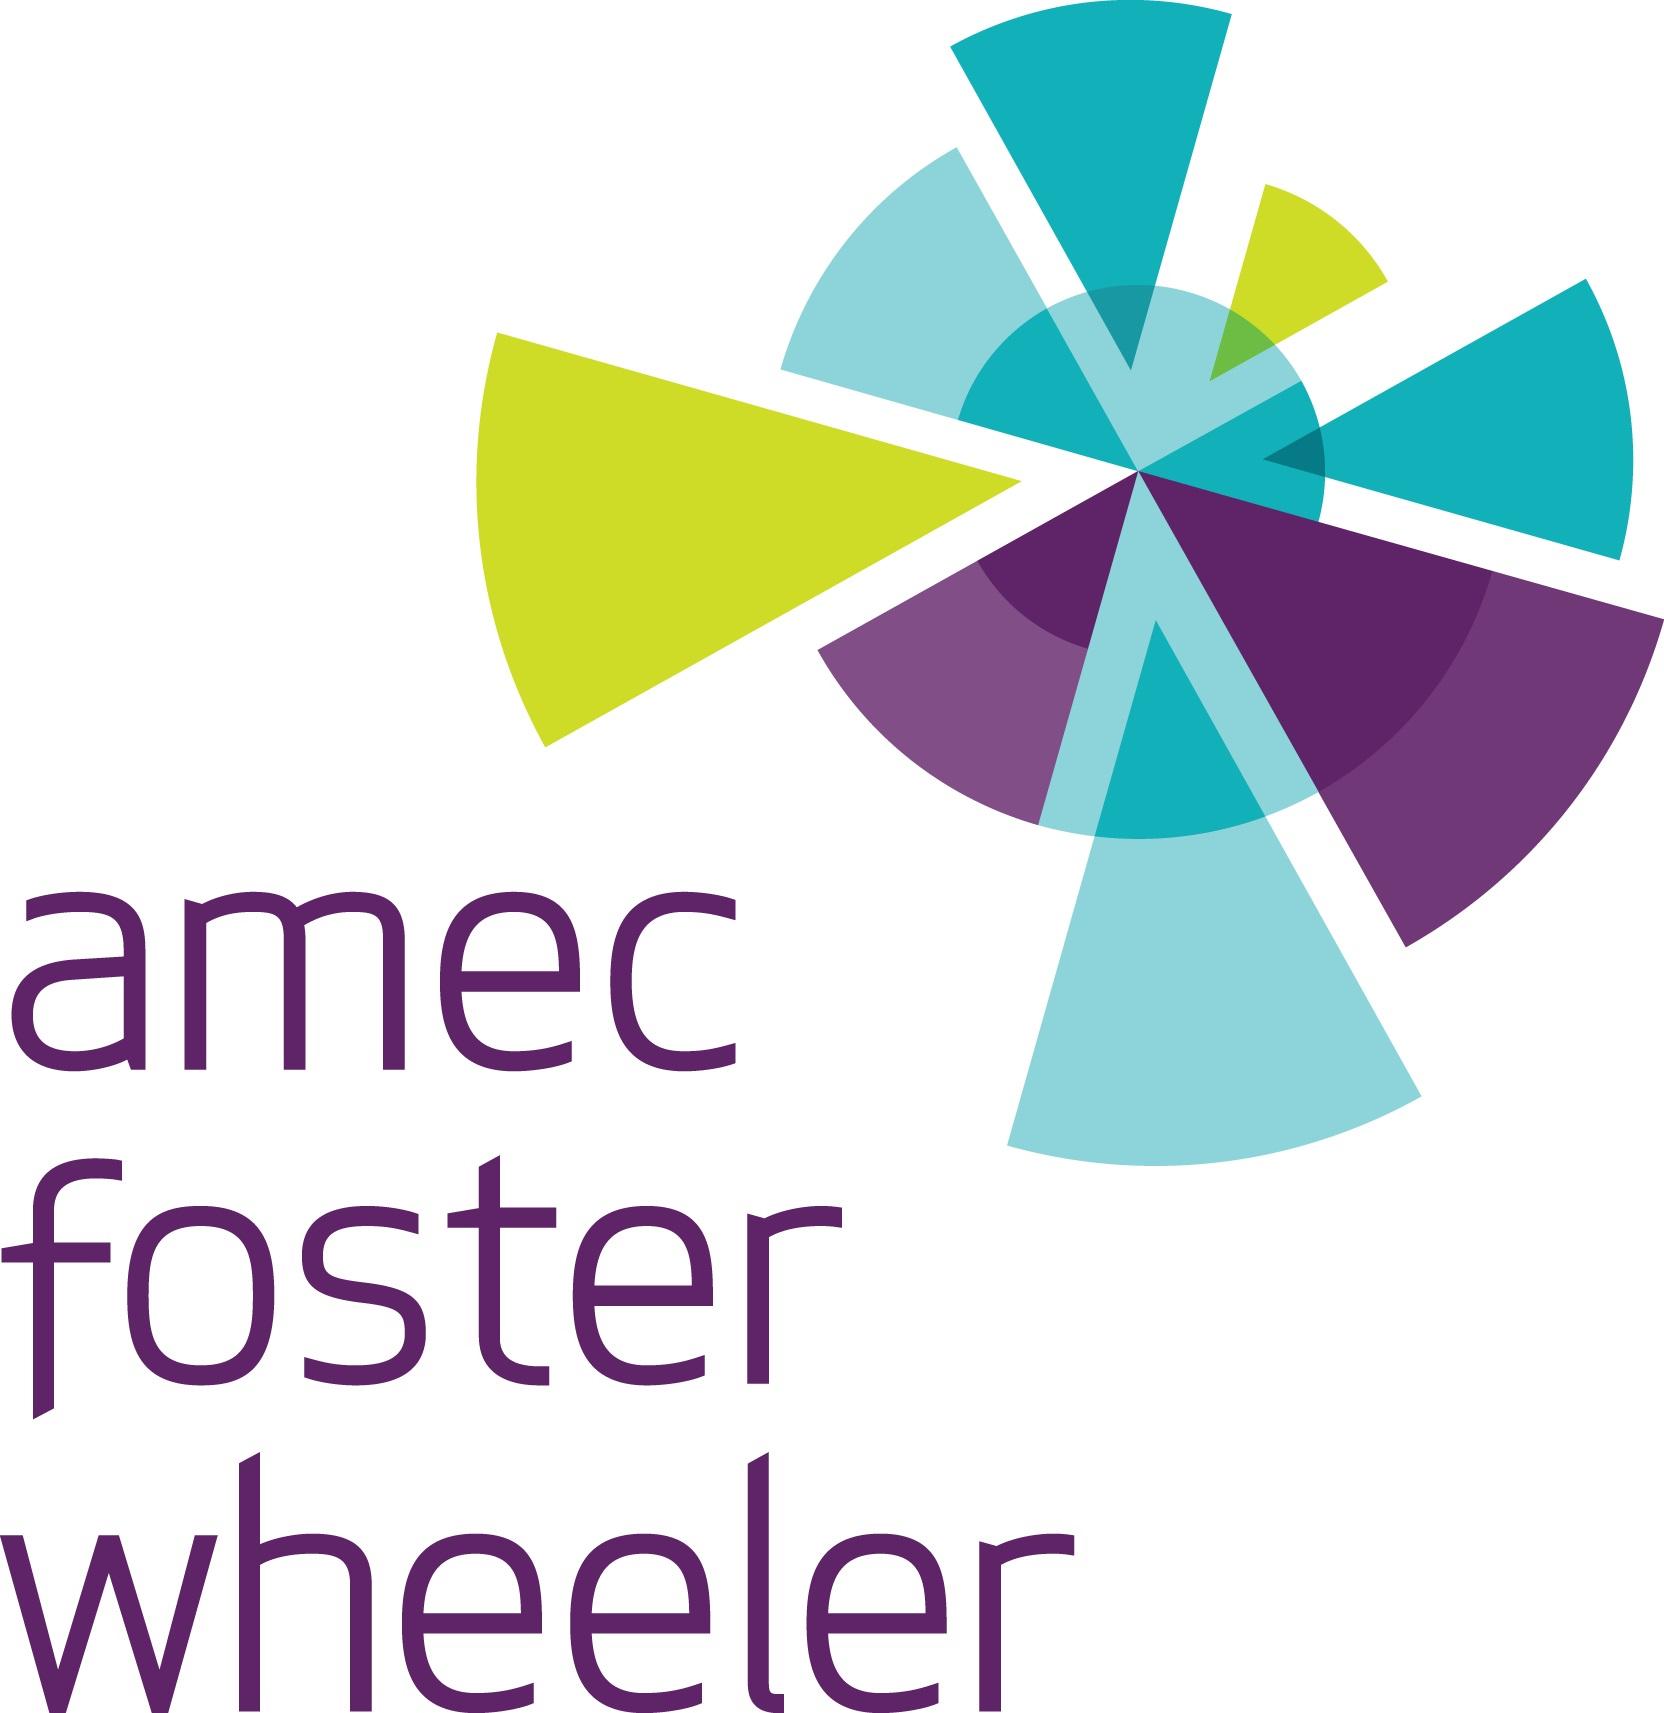 Amec Foster Wheeler Environment & Infrastructure's